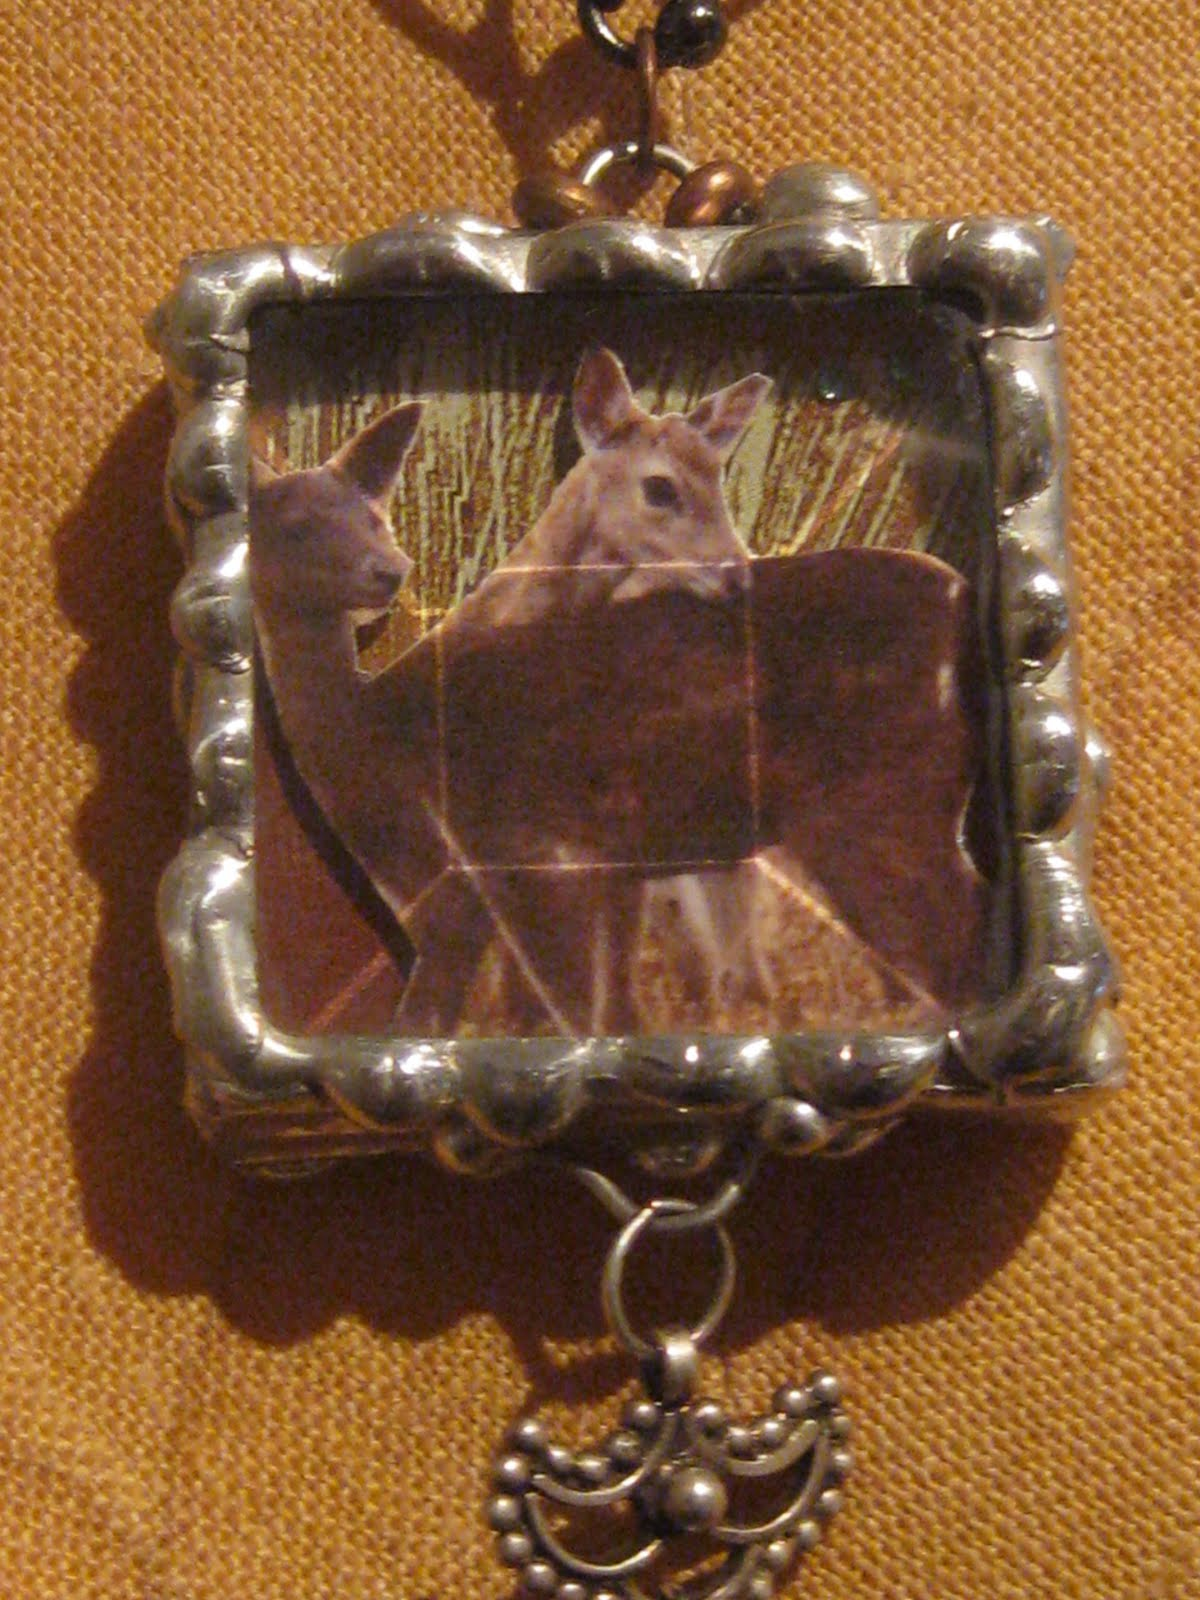 stephen d farmer animal spirit guide raccoon